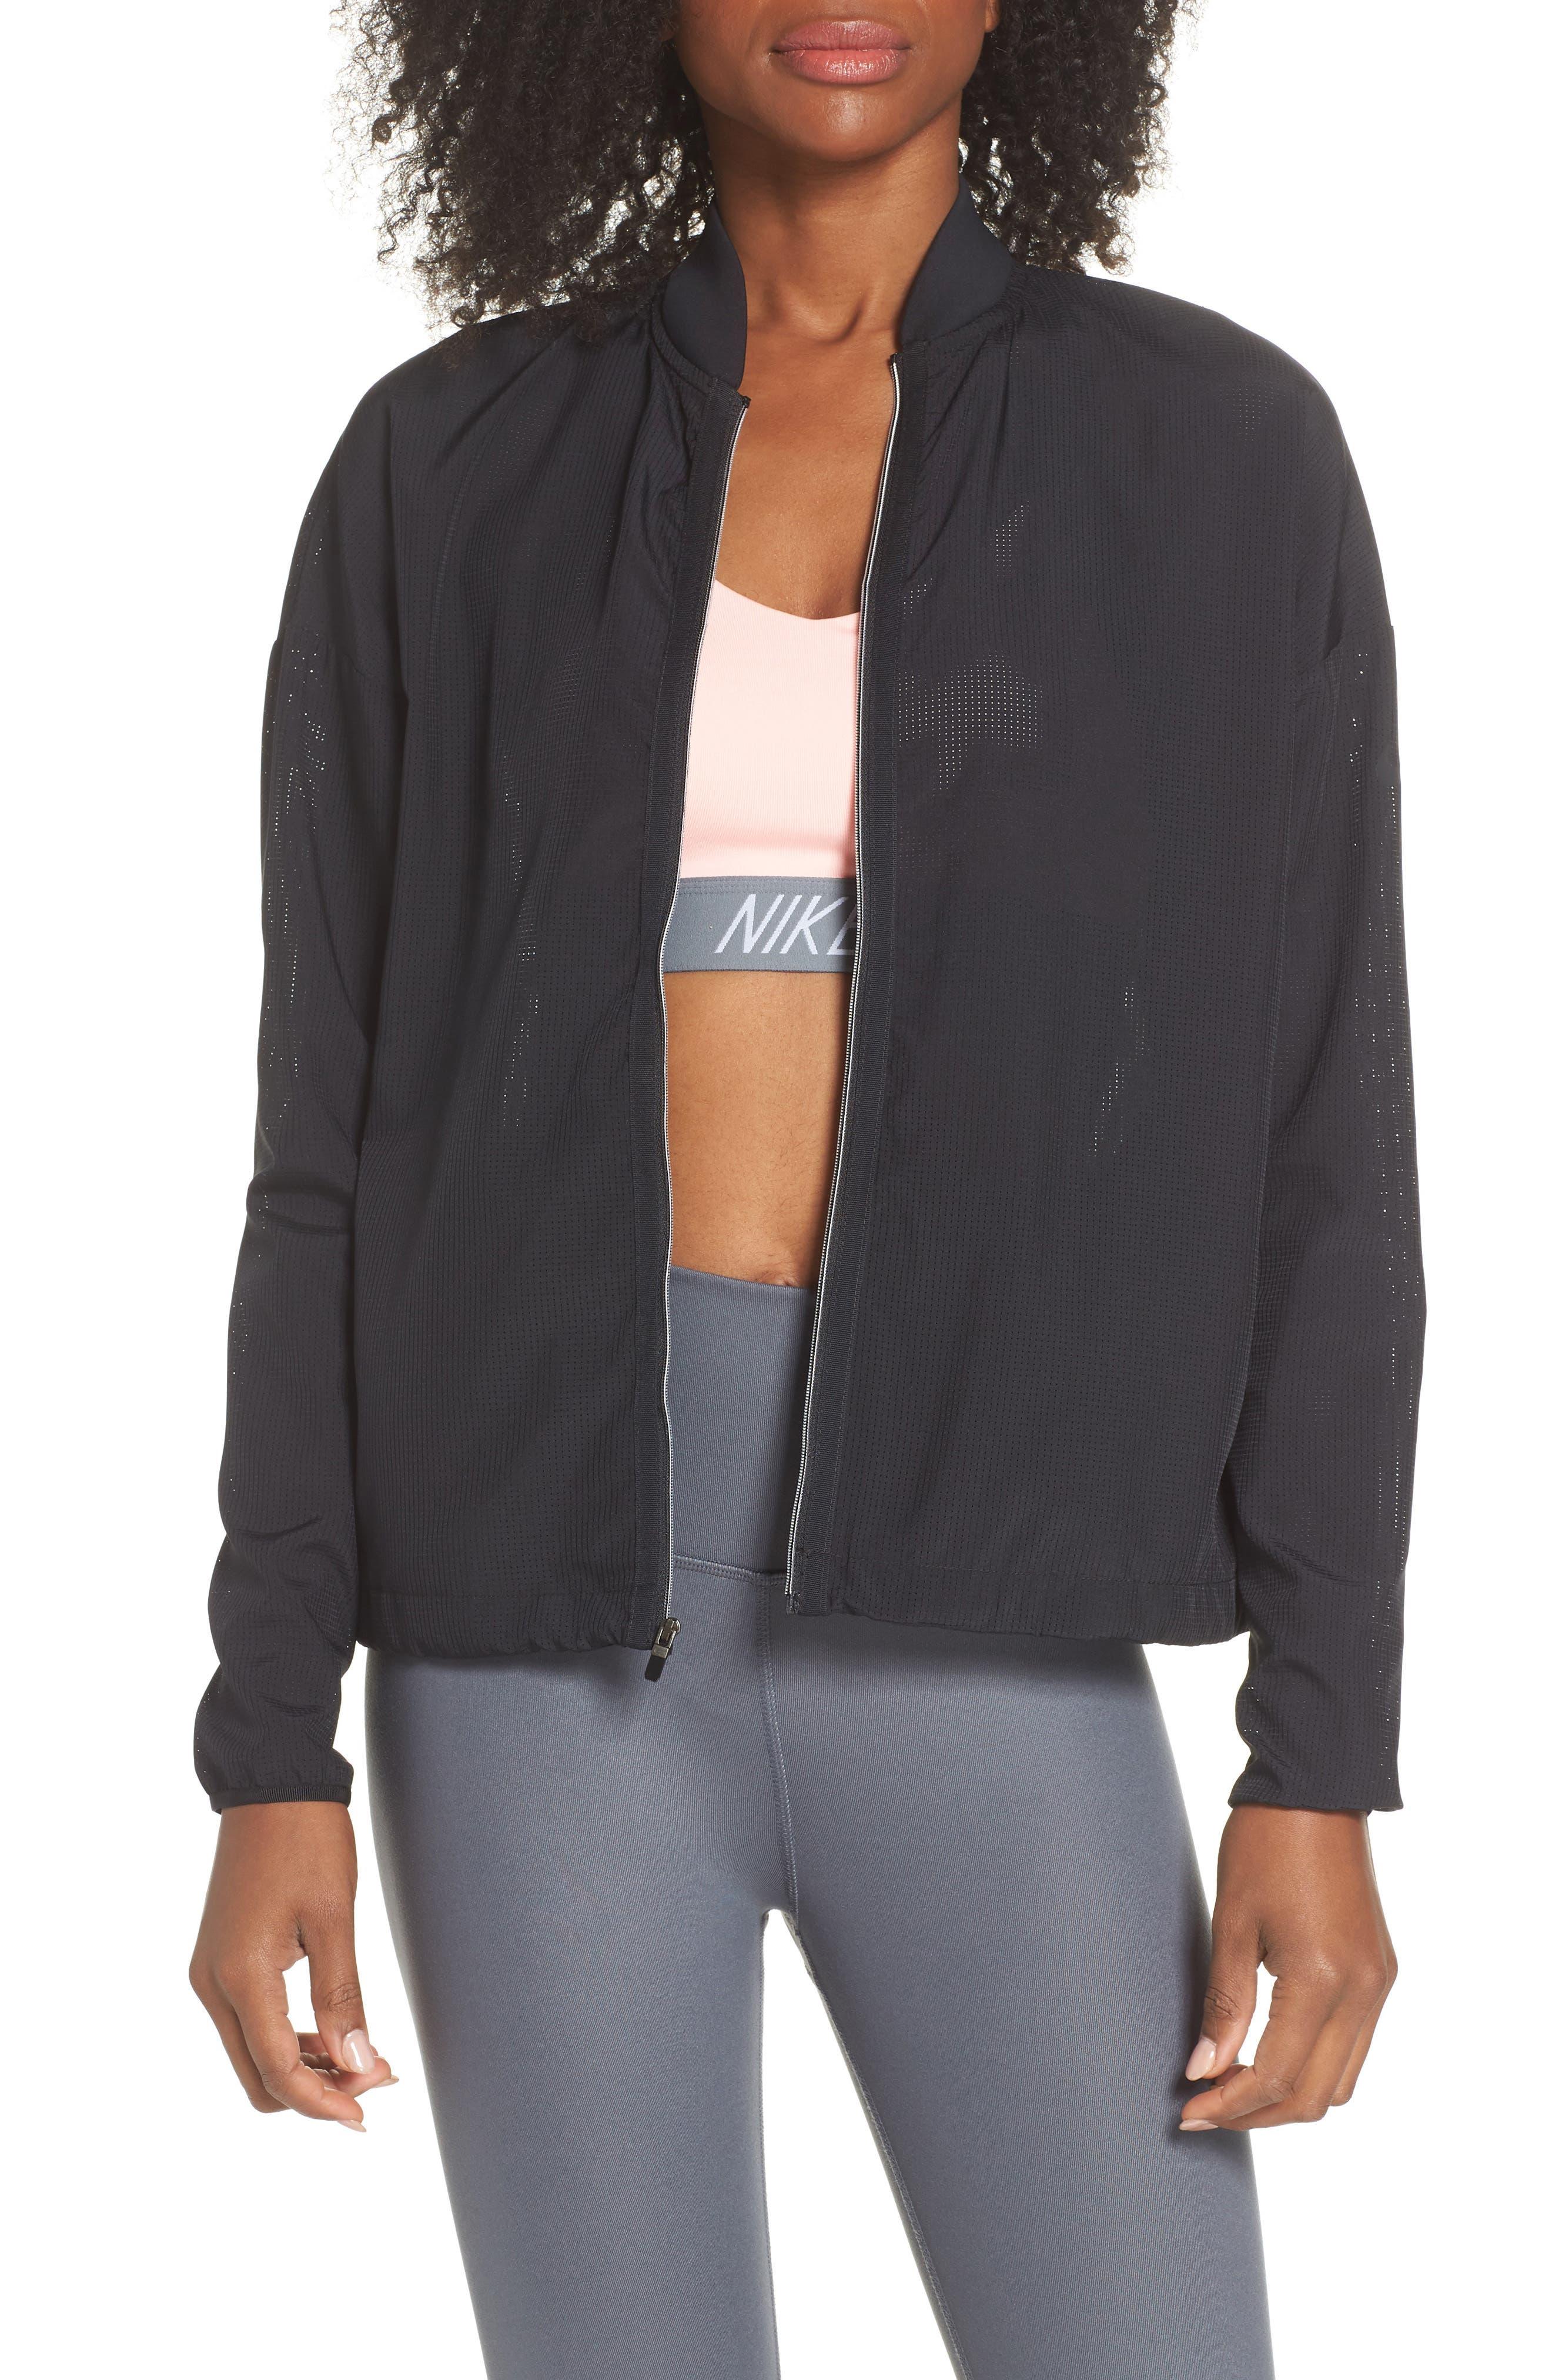 NIKE Flex Bliss Training Jacket, Main, color, 010